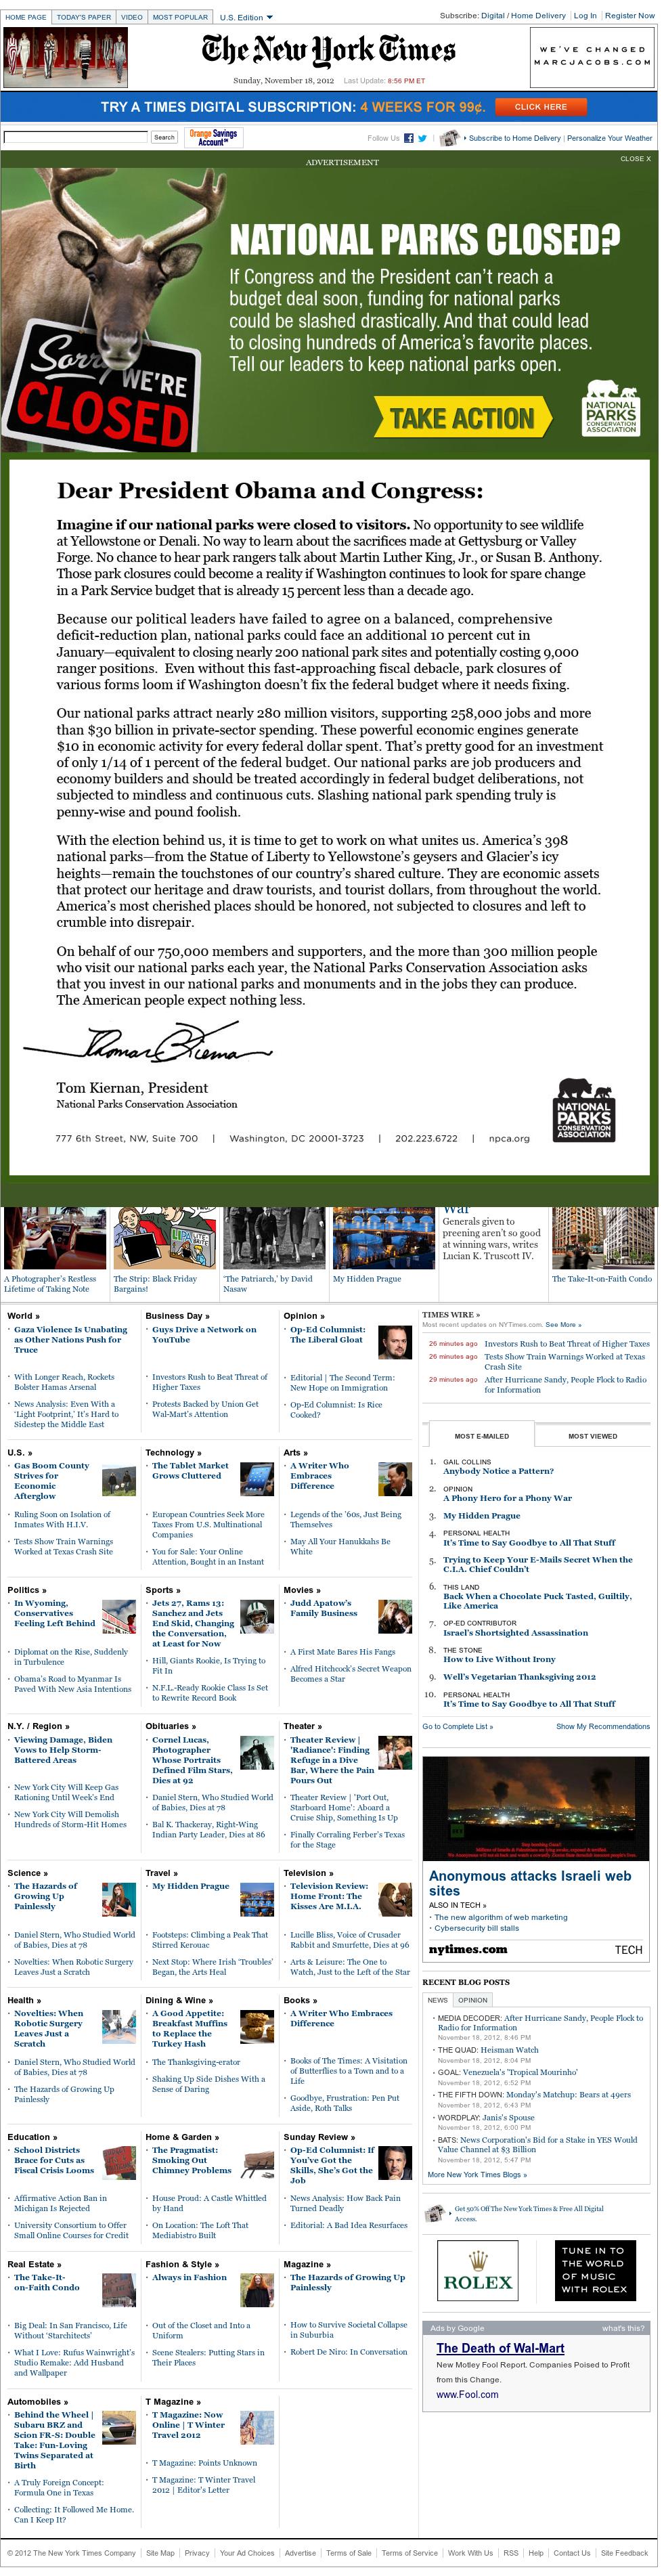 The New York Times at Monday Nov. 19, 2012, 2:21 a.m. UTC